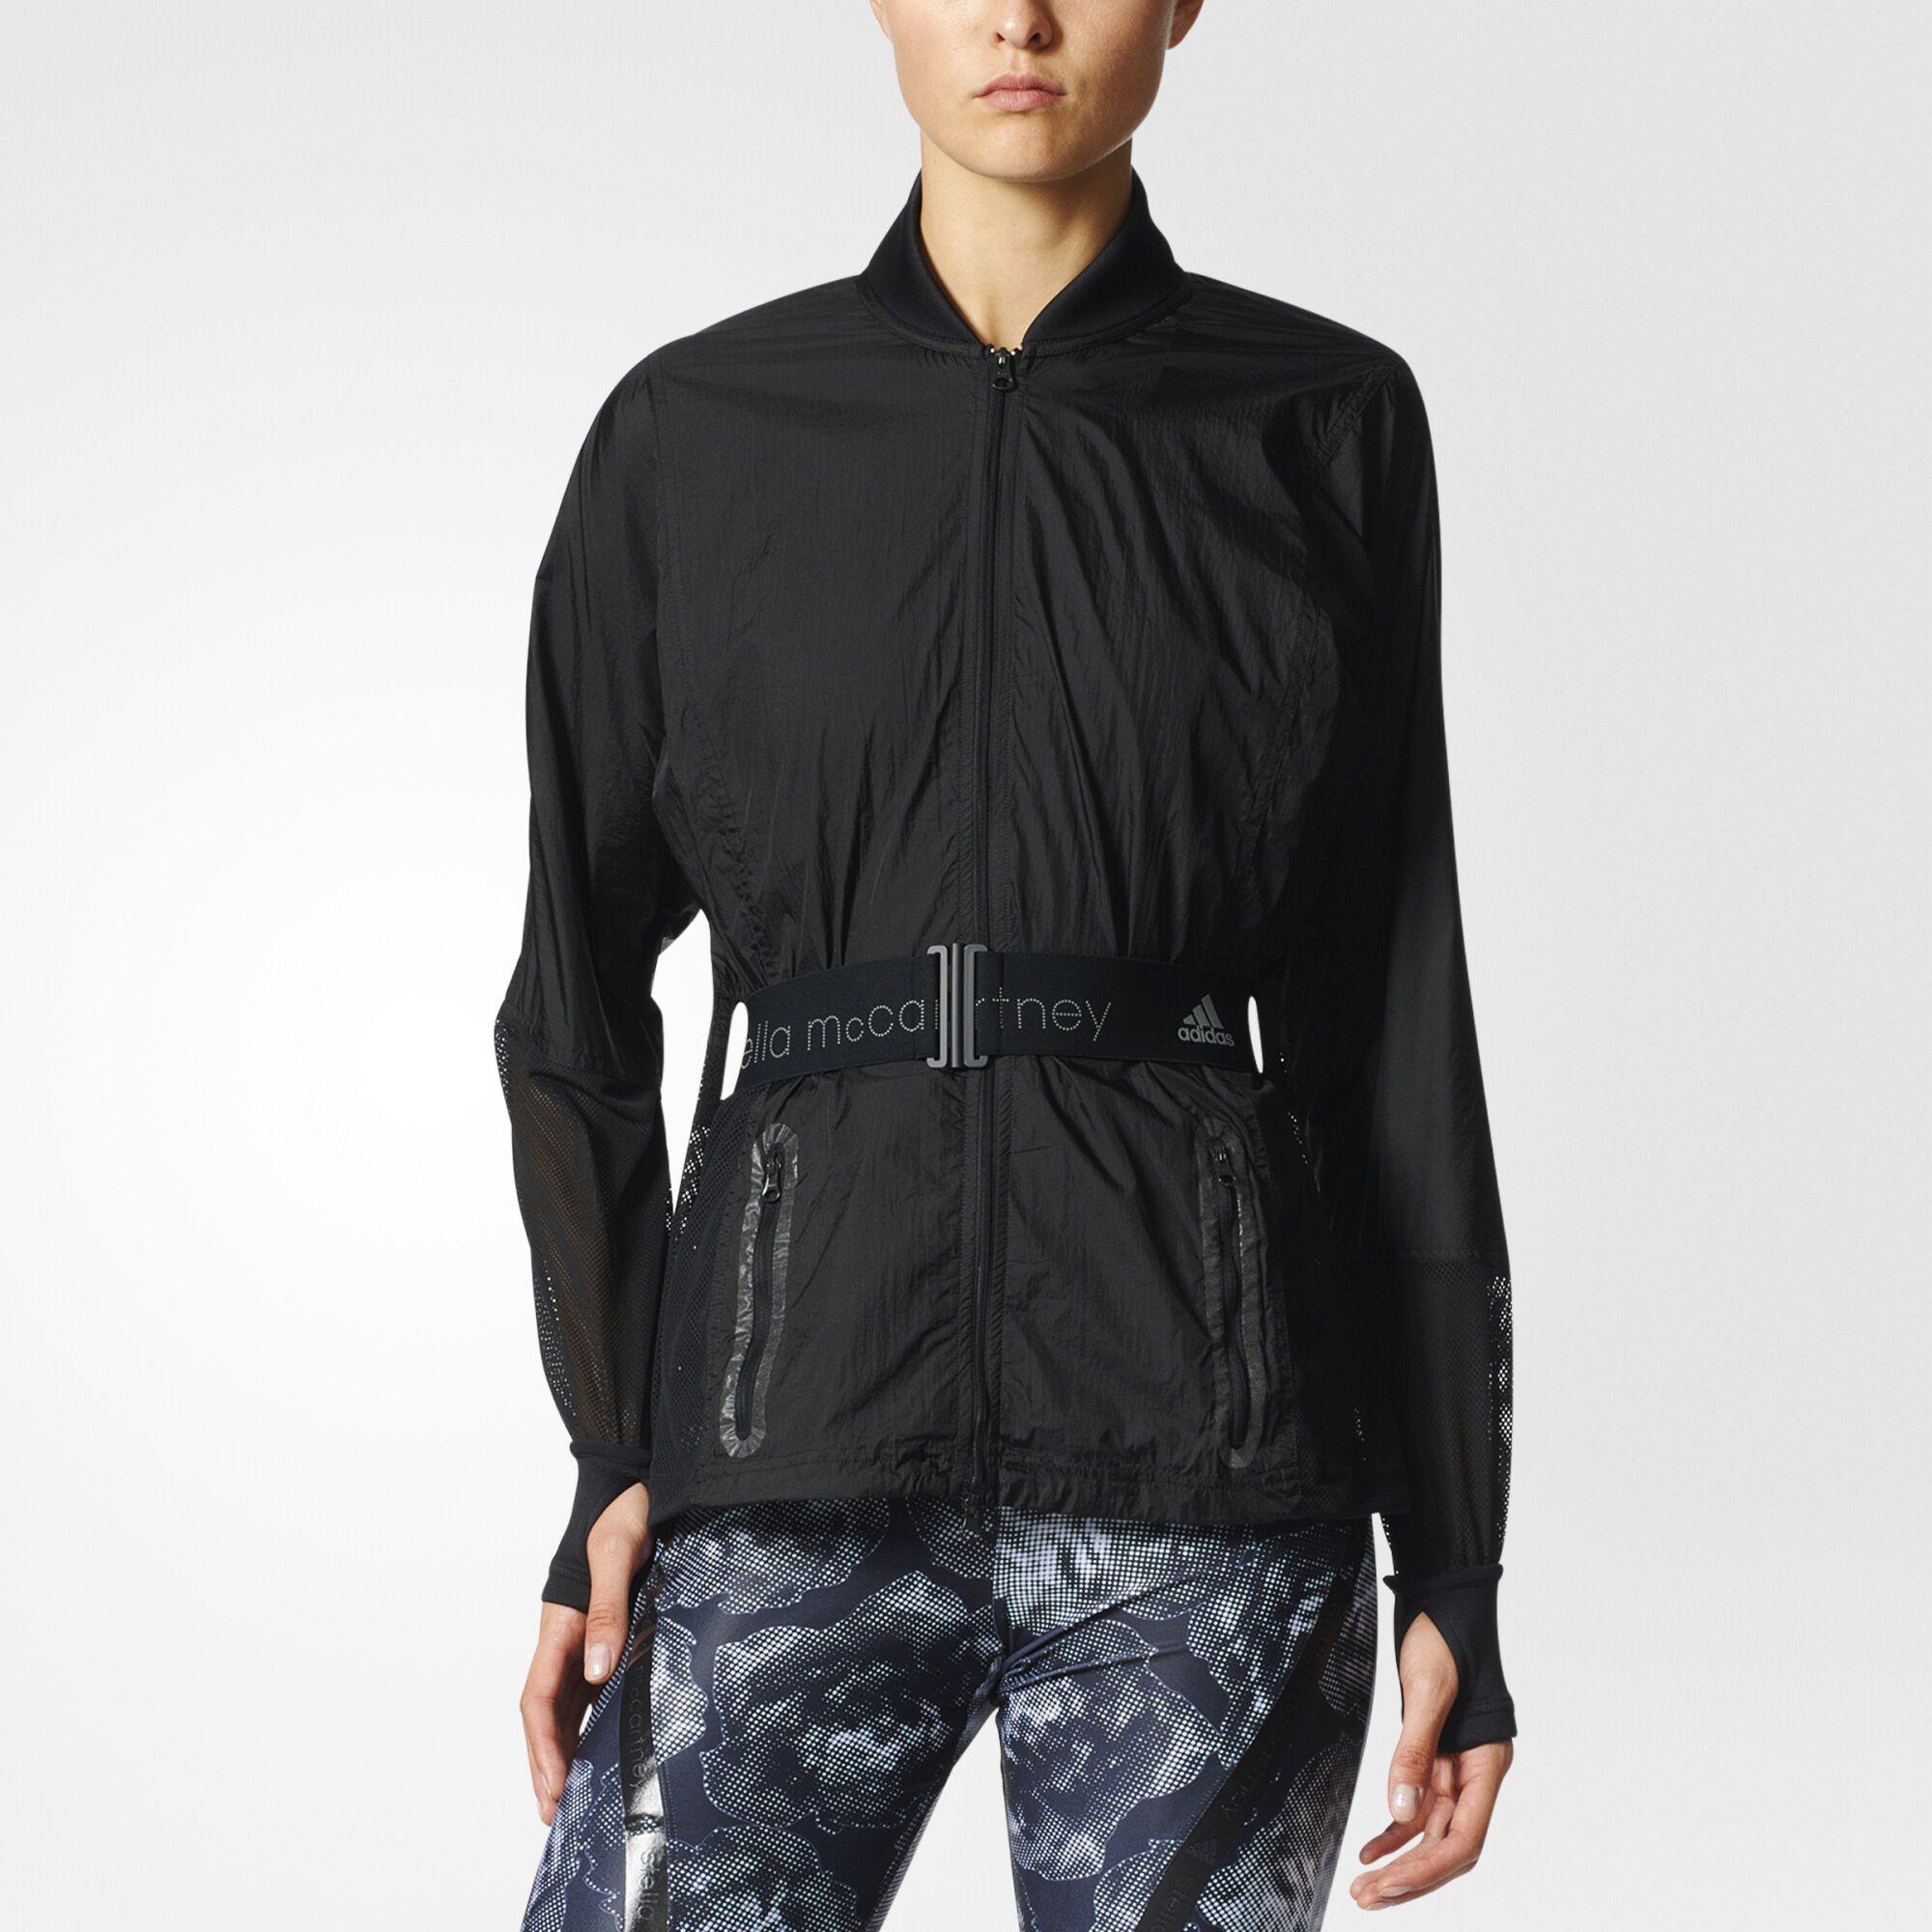 Adidas jacket - Adidas Run Jacket Black S99199